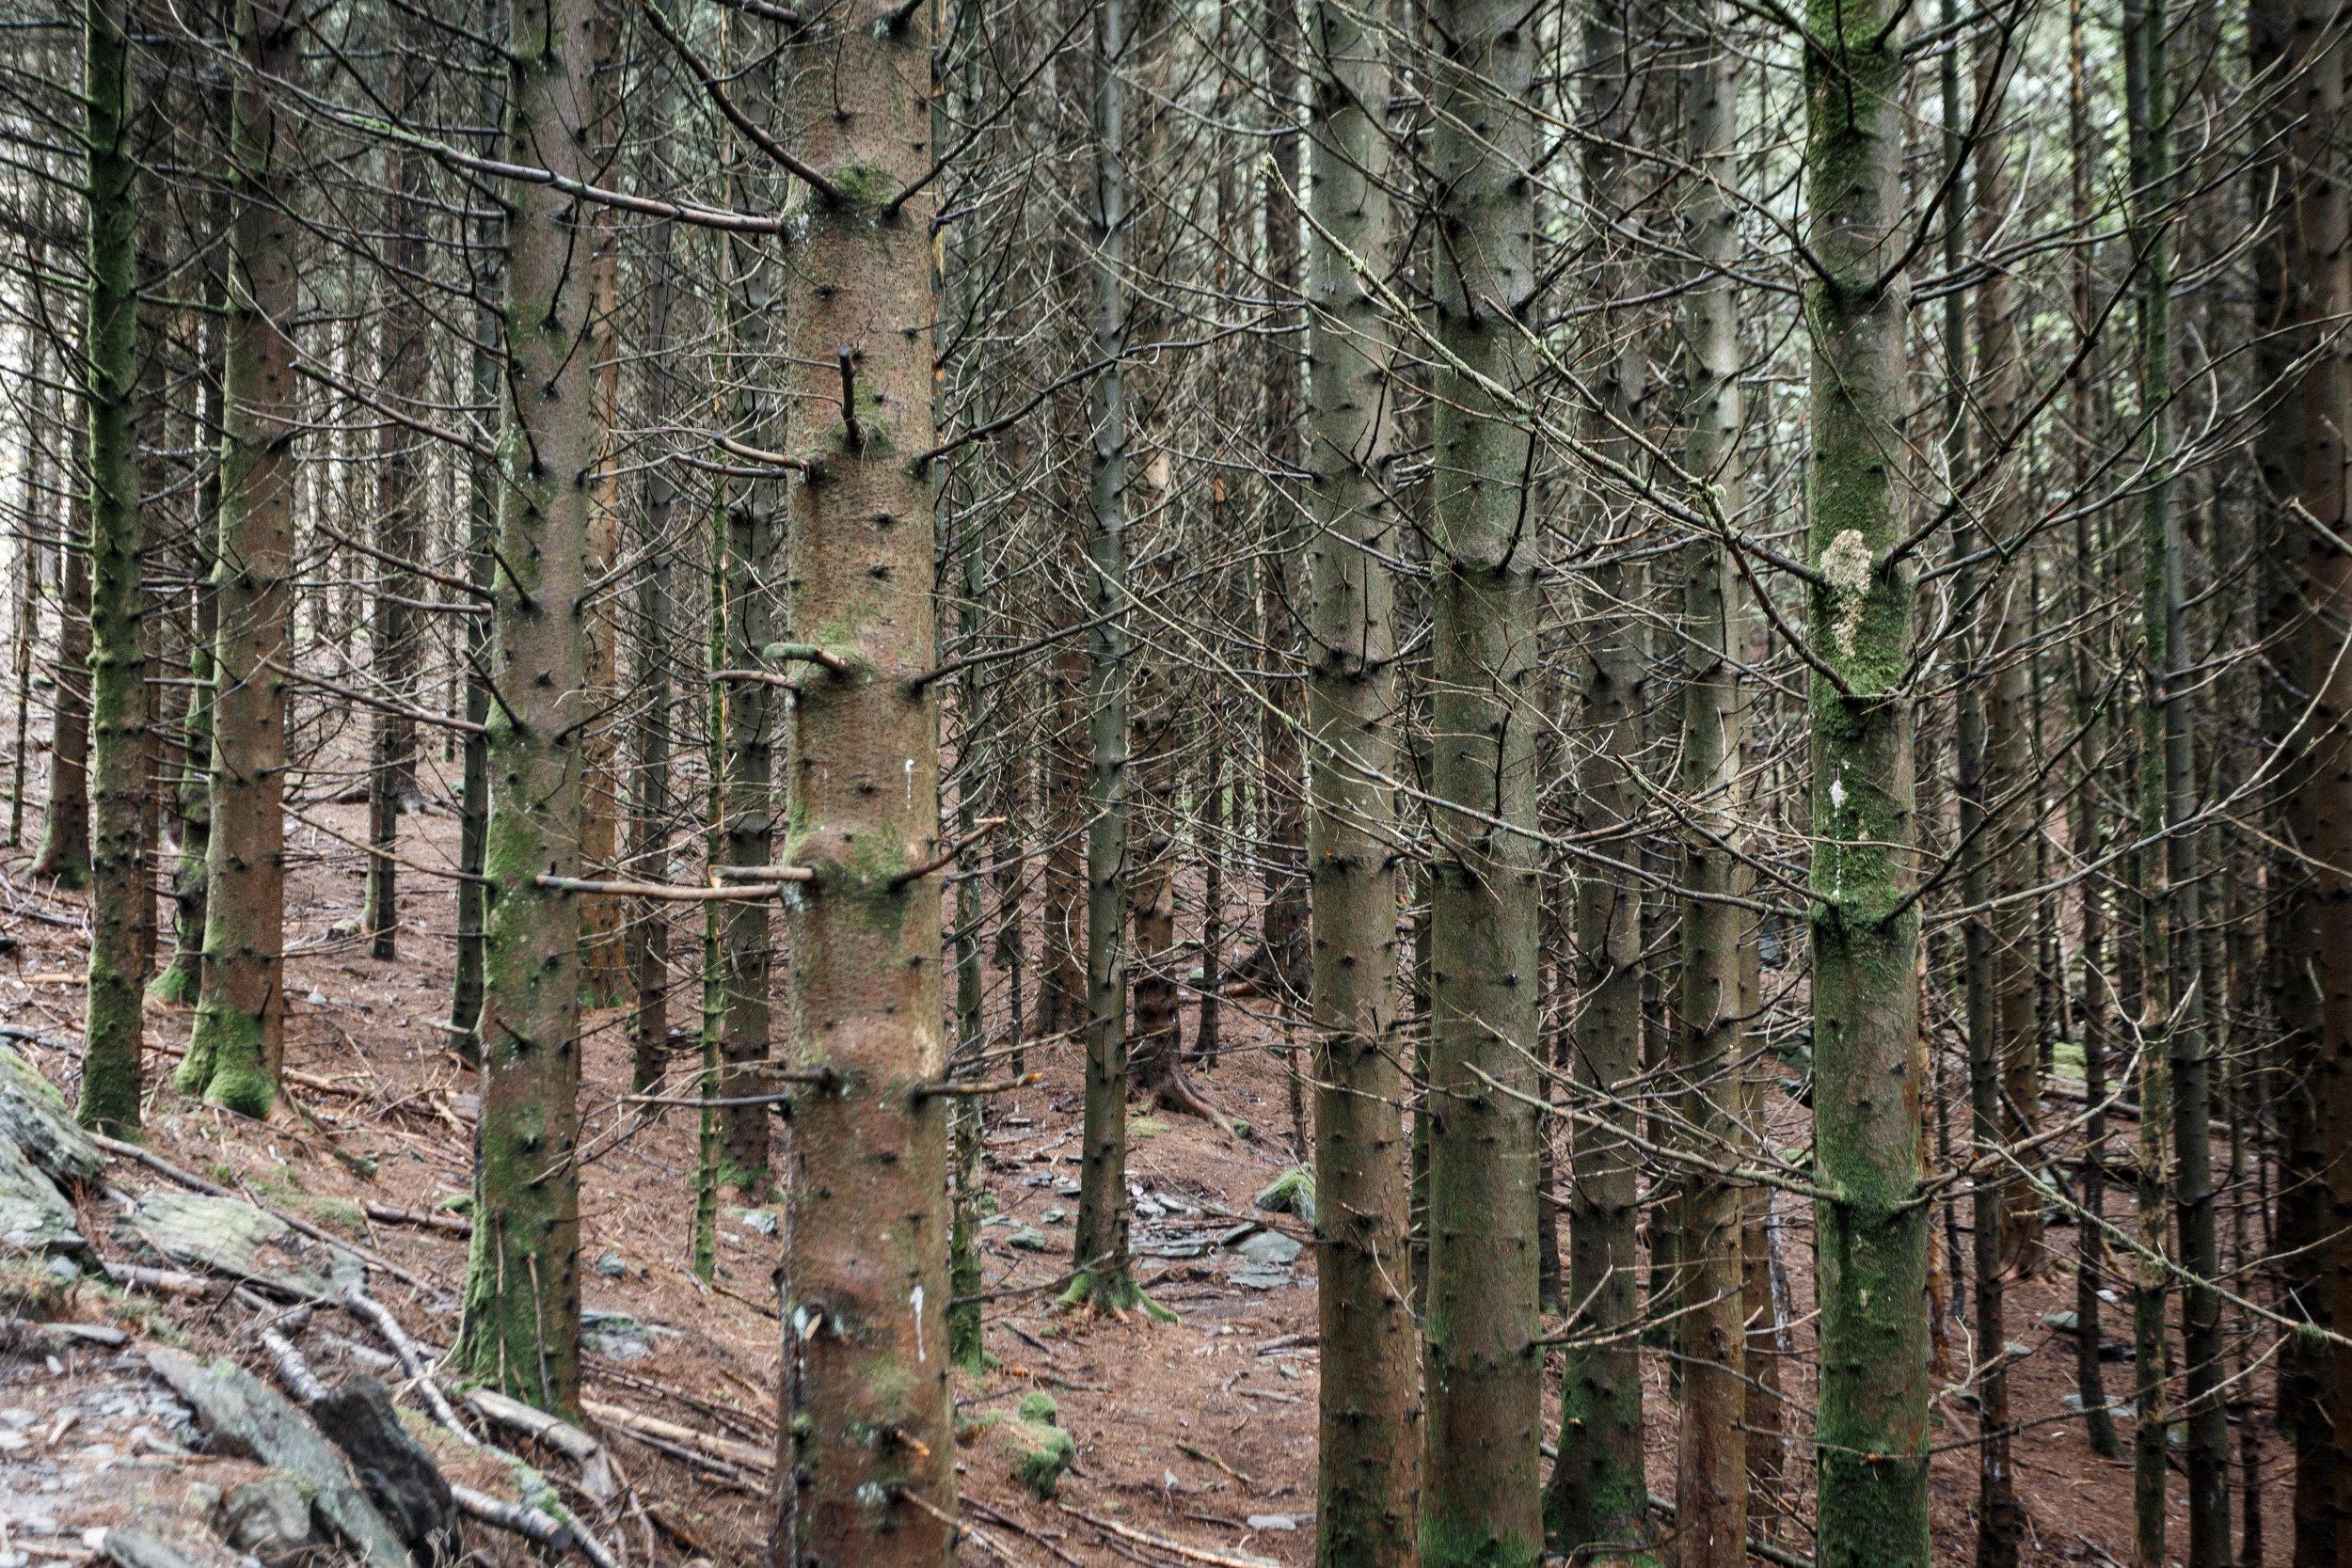 North_forest_11.jpg